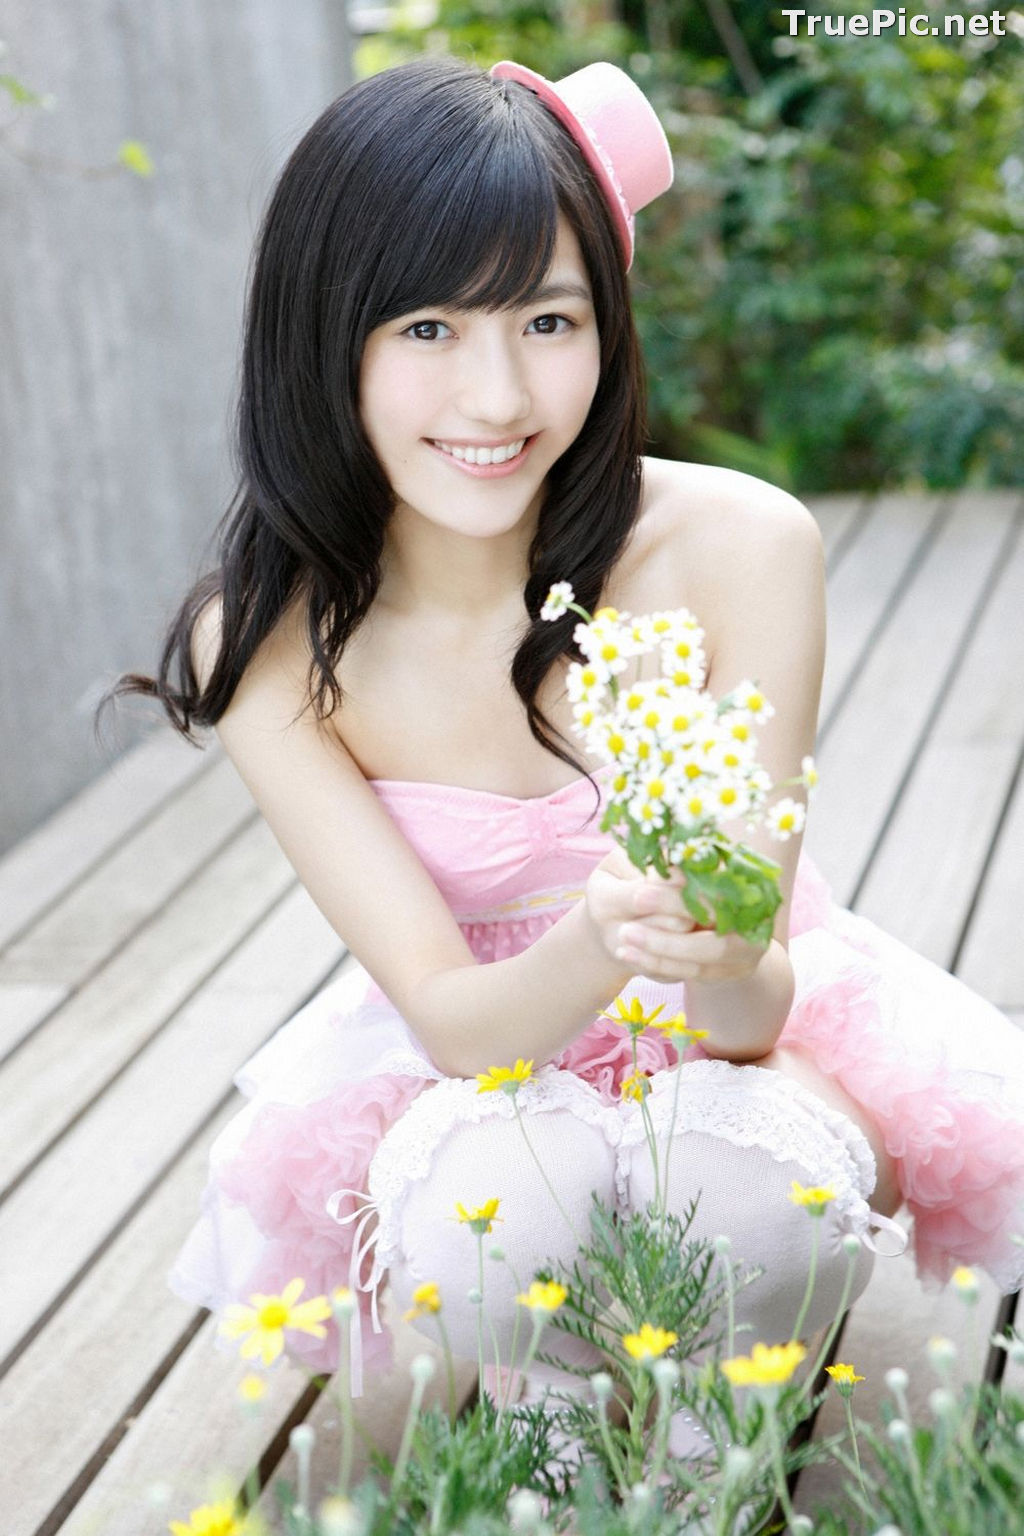 Image [YS Web] Vol.531 - Japanese Idol Girl Group (AKB48) - Mayu Watanabe - TruePic.net - Picture-5